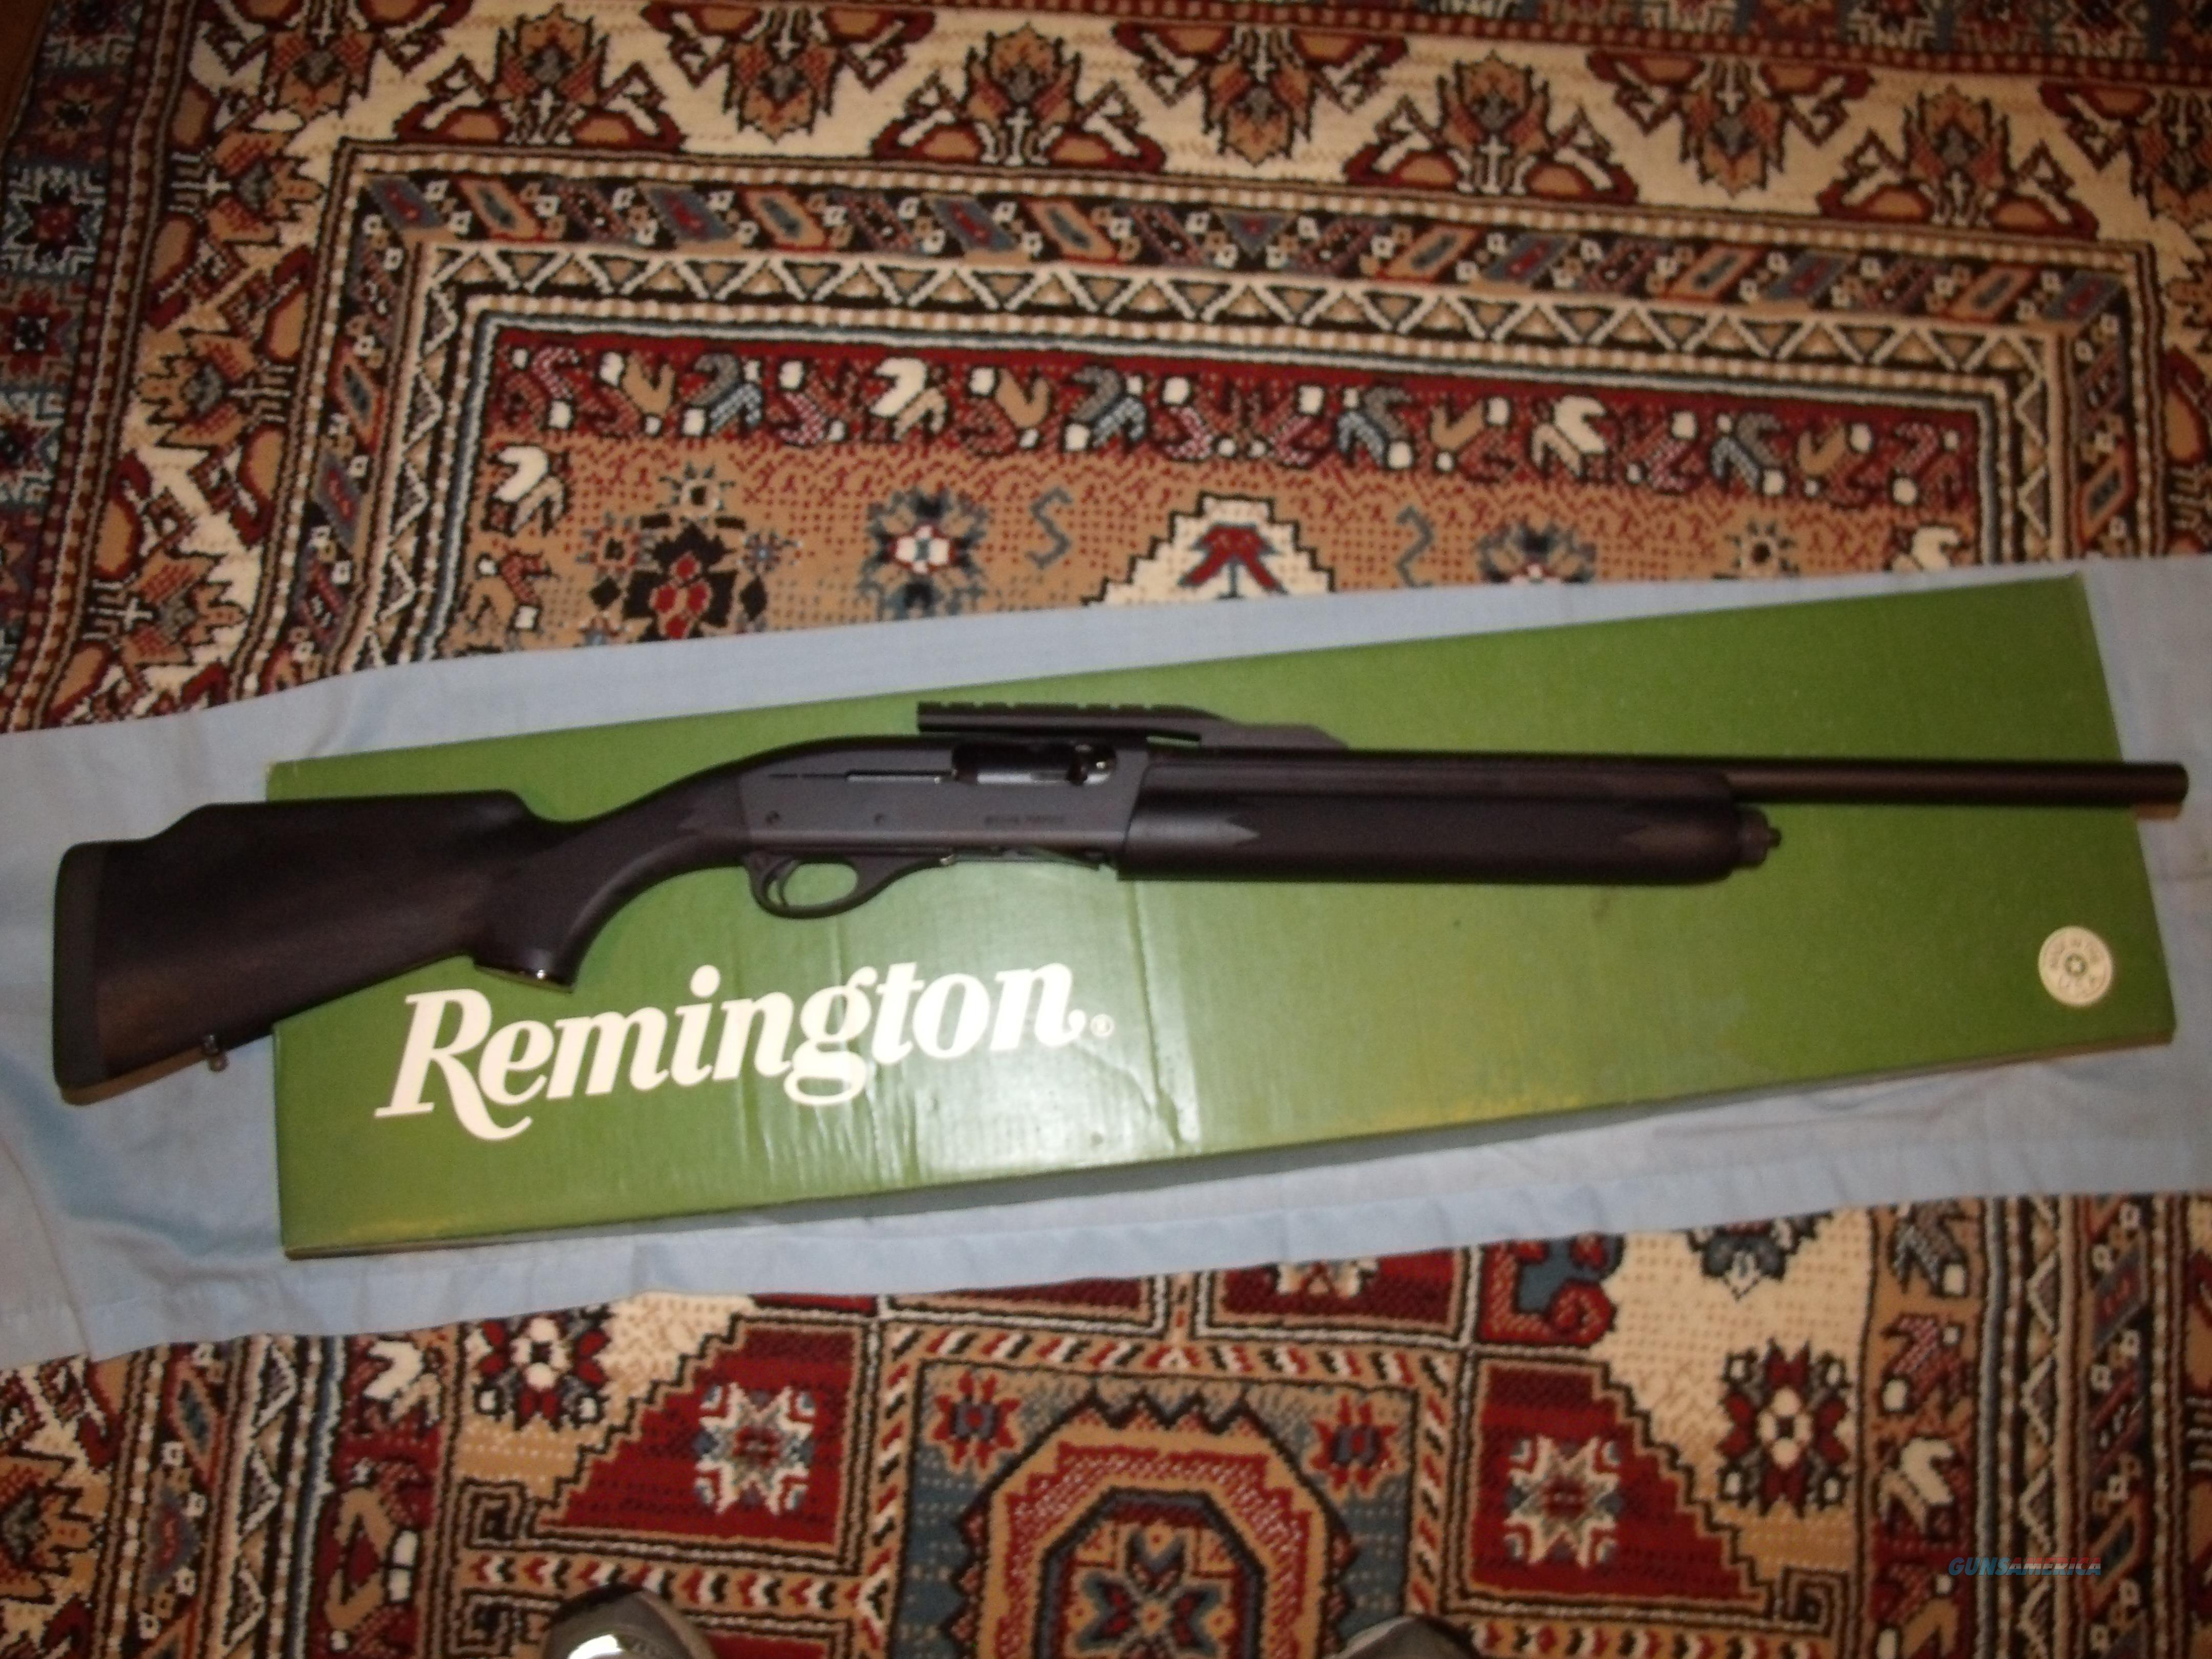 REMINGTON MODEL 1187 CANTILEVER DEER  Guns > Shotguns > Remington Shotguns  > Autoloaders > Hunting